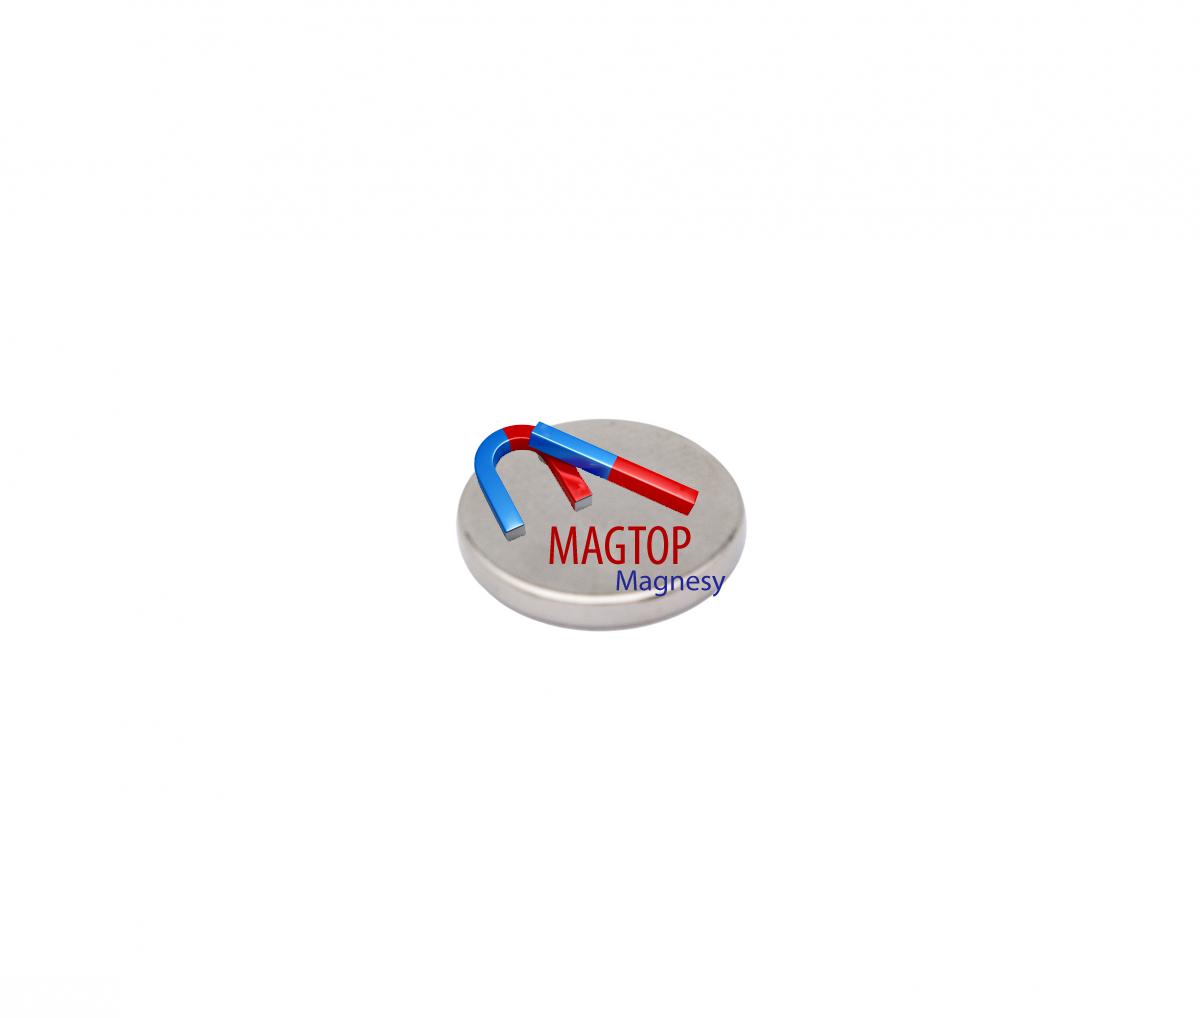 MW 17 x 2 N42 MAGNES NEODYMOWY WALCOWY